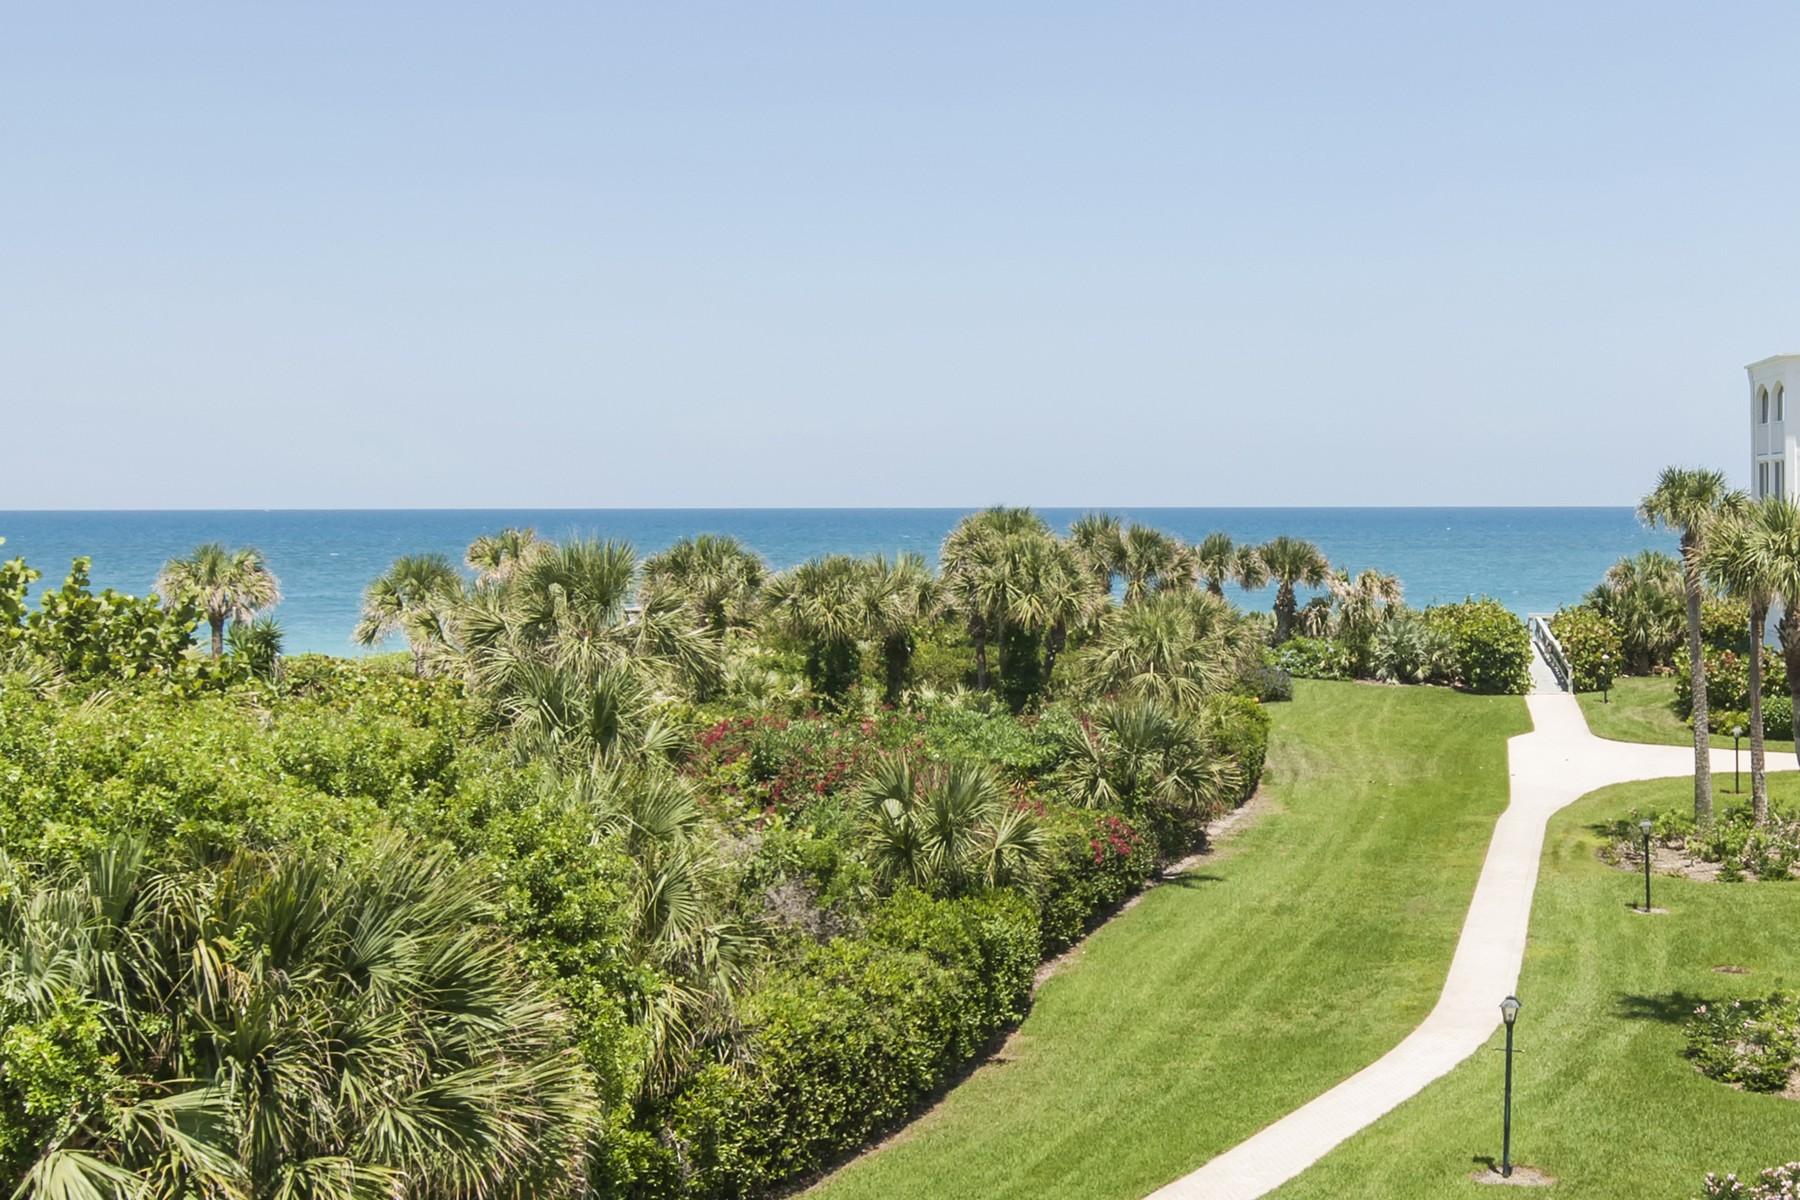 Nhà chung cư vì Bán tại Elegant and Spacious Oceanfront Condo 5690 Highway A1A #203N Indian River Shores, Florida, 32963 Hoa Kỳ